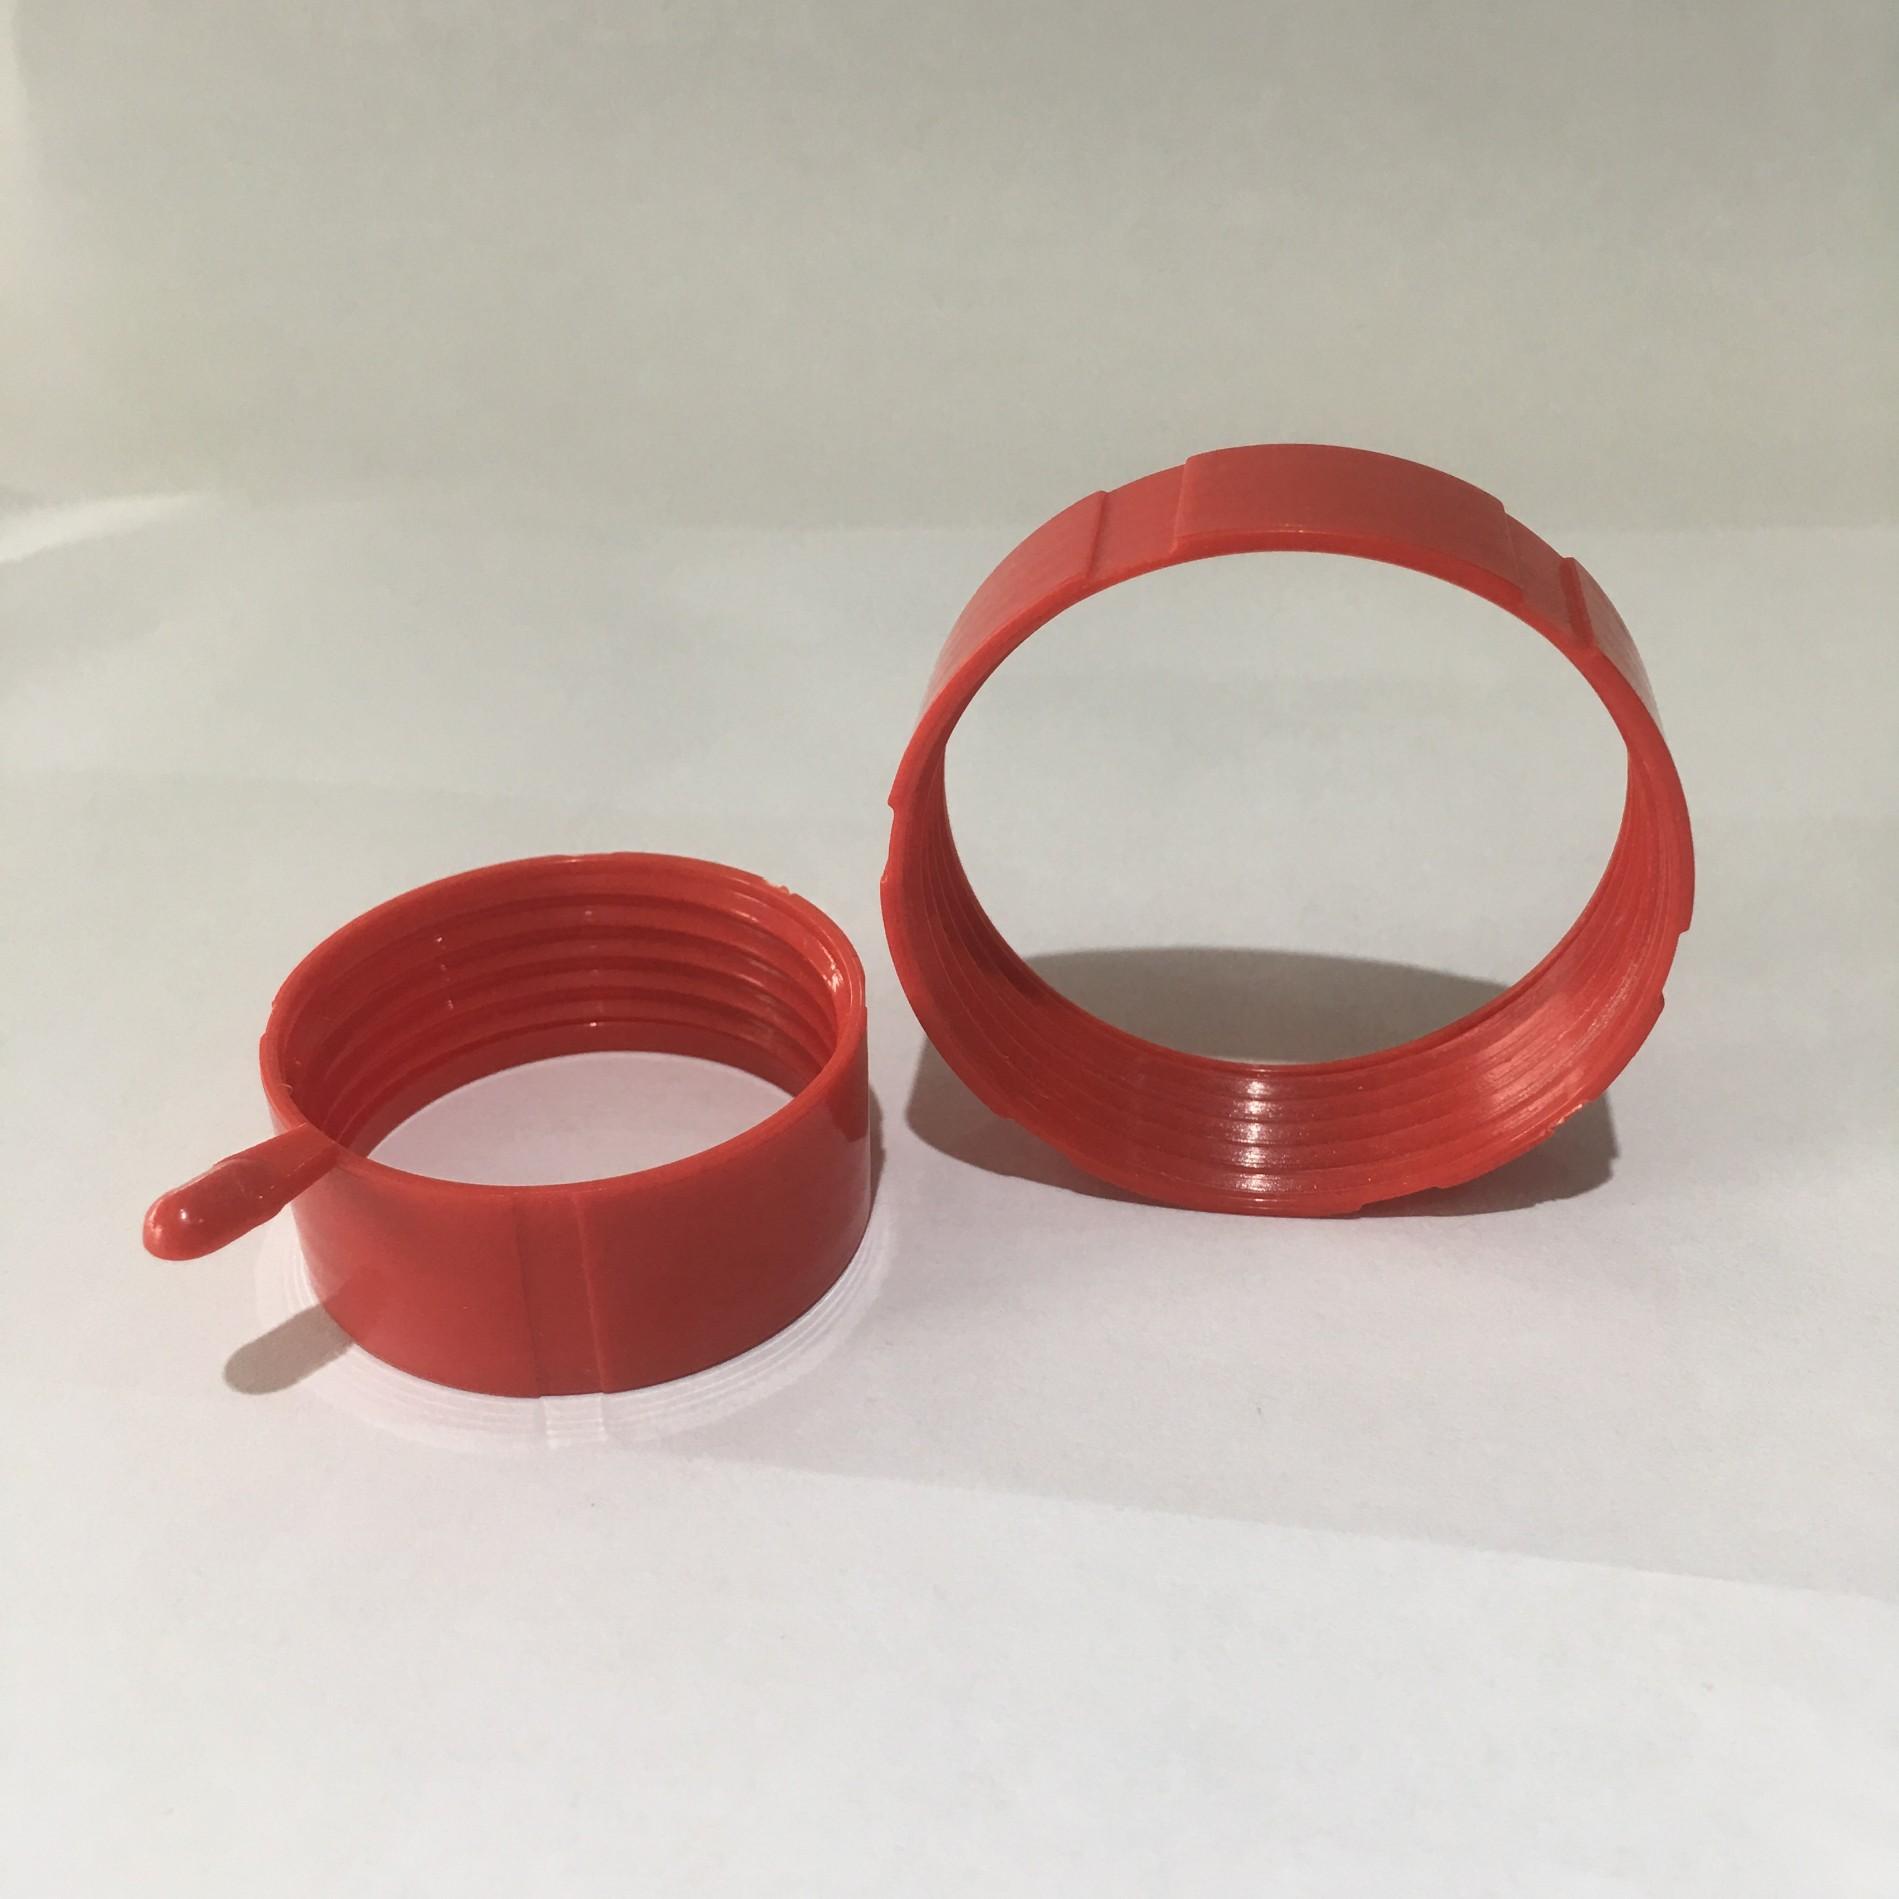 Custom Molded Plastic Production Part Manufacturers, Custom Molded Plastic Production Part Factory, Supply Custom Molded Plastic Production Part